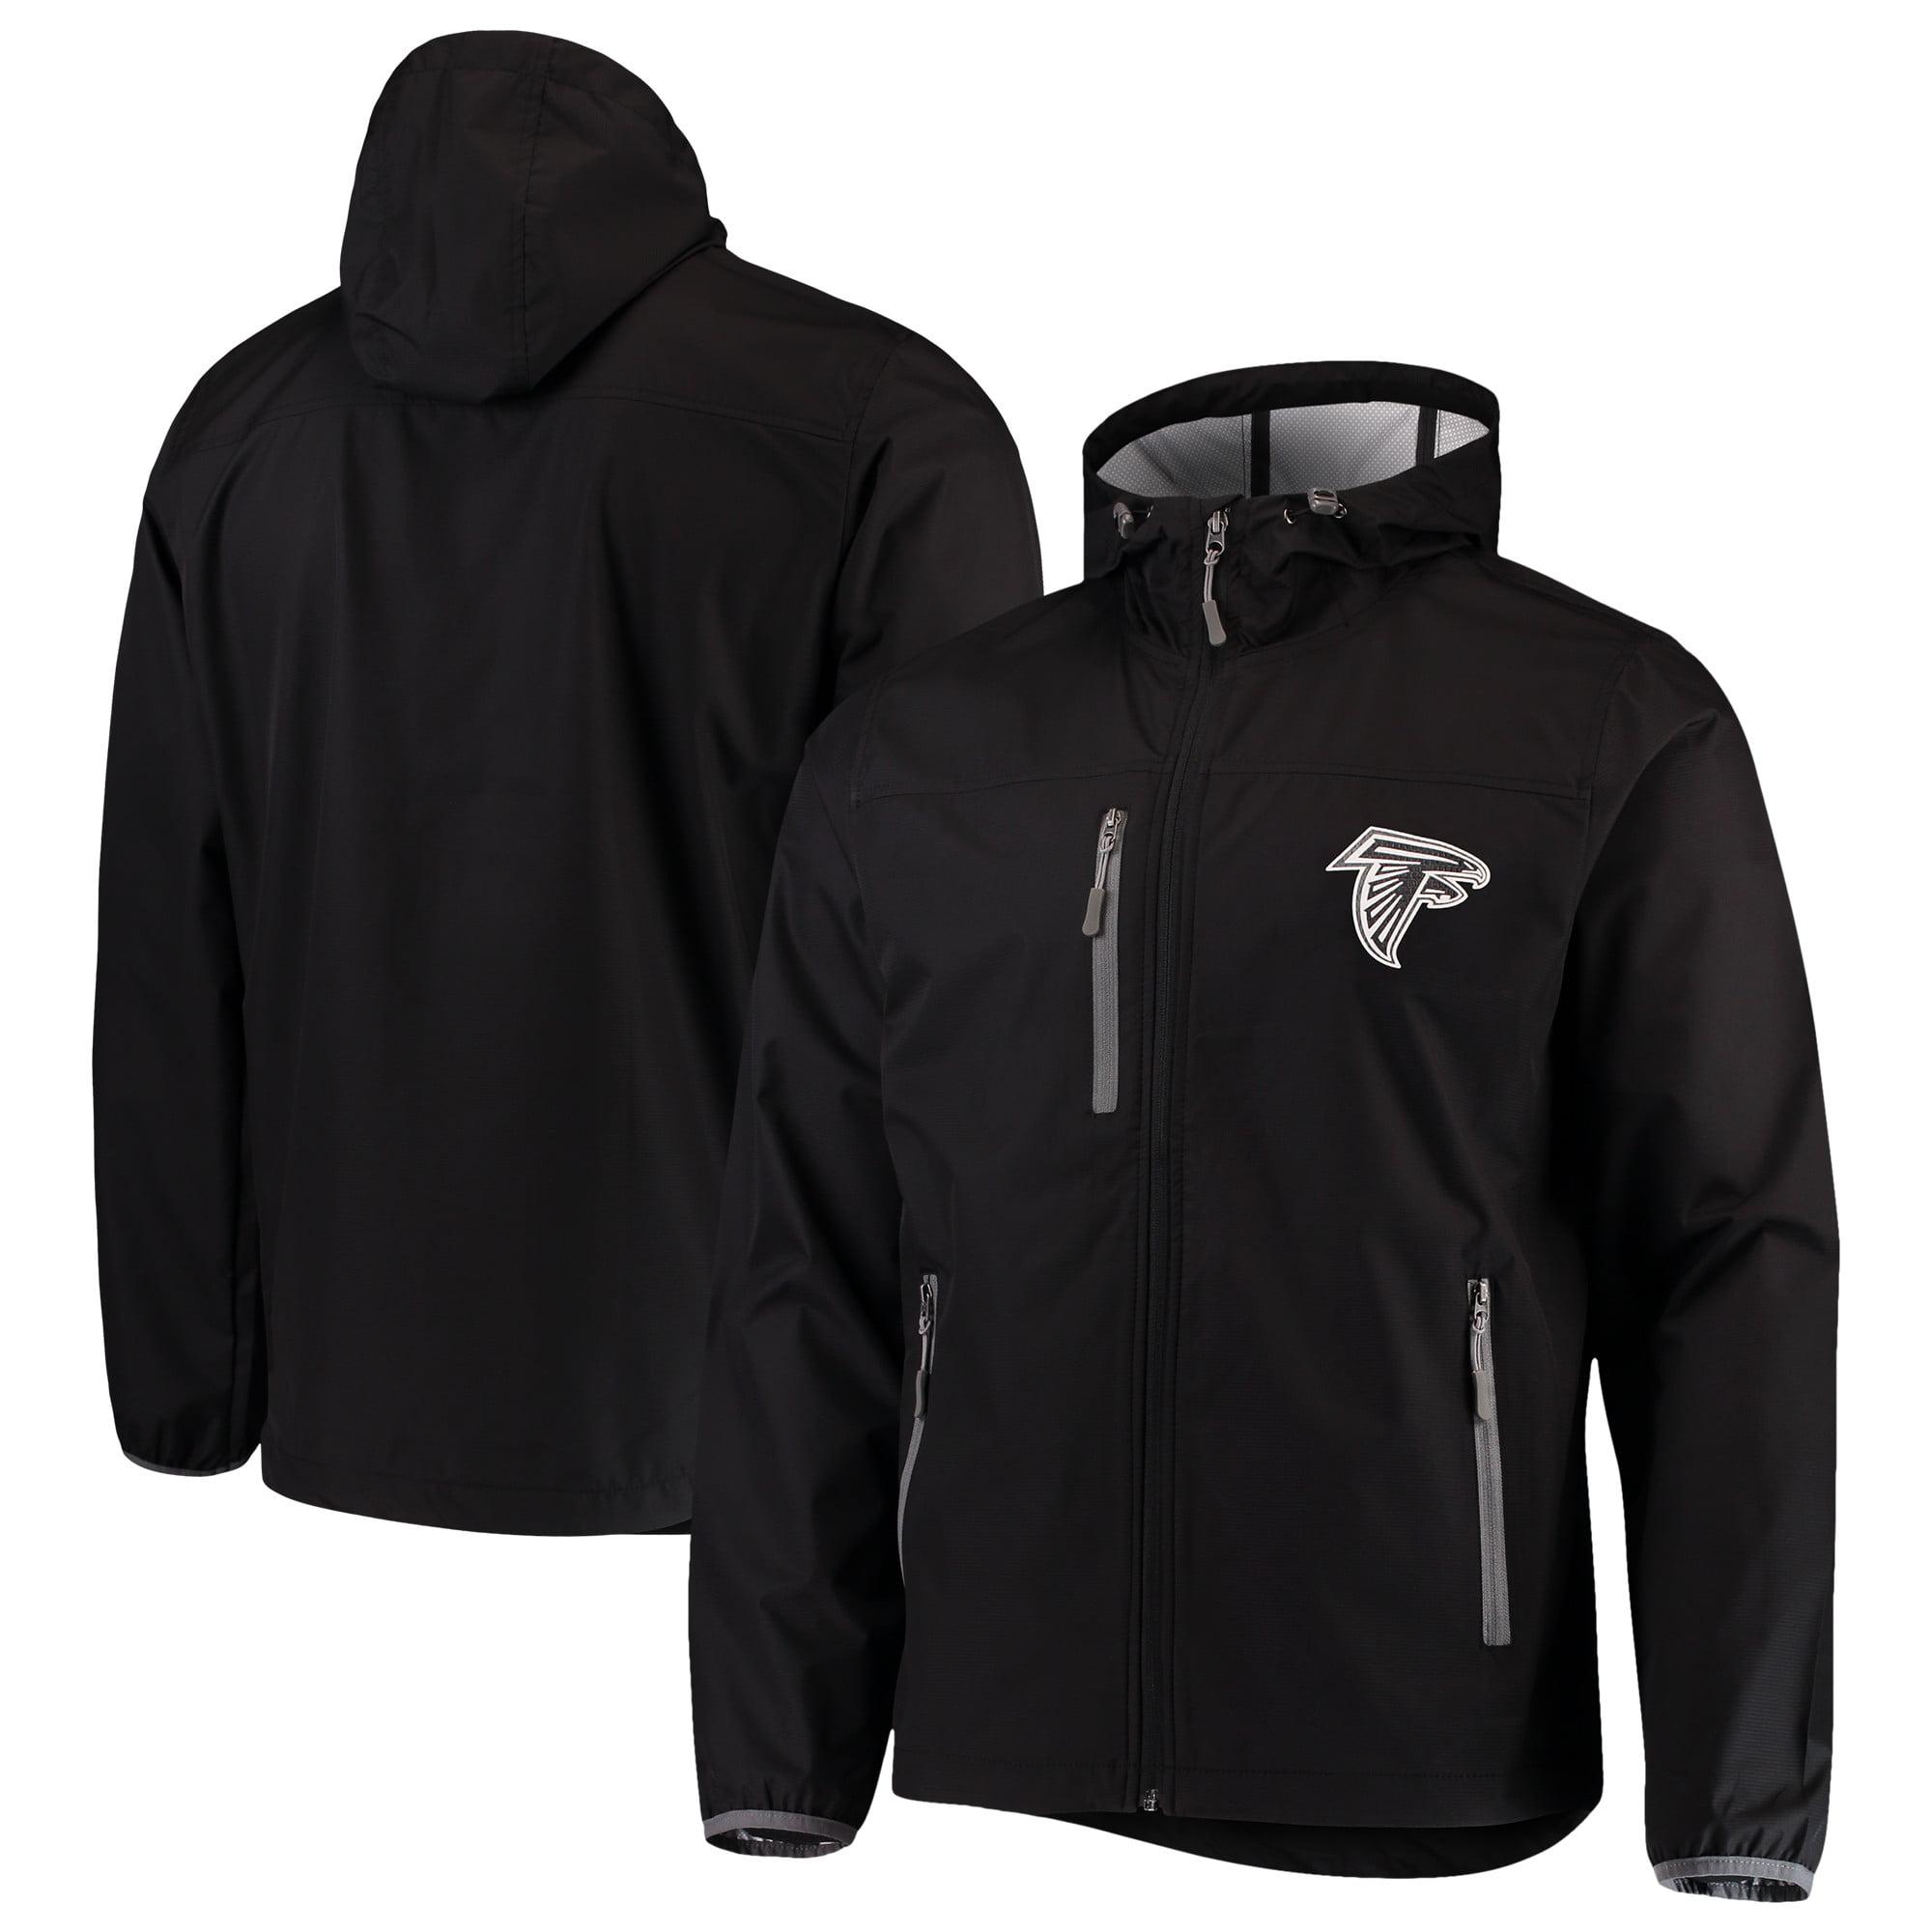 Atlanta Falcons G-III Sports by Carl Banks Trick Play Full-Zip Hooded Jacket - Black